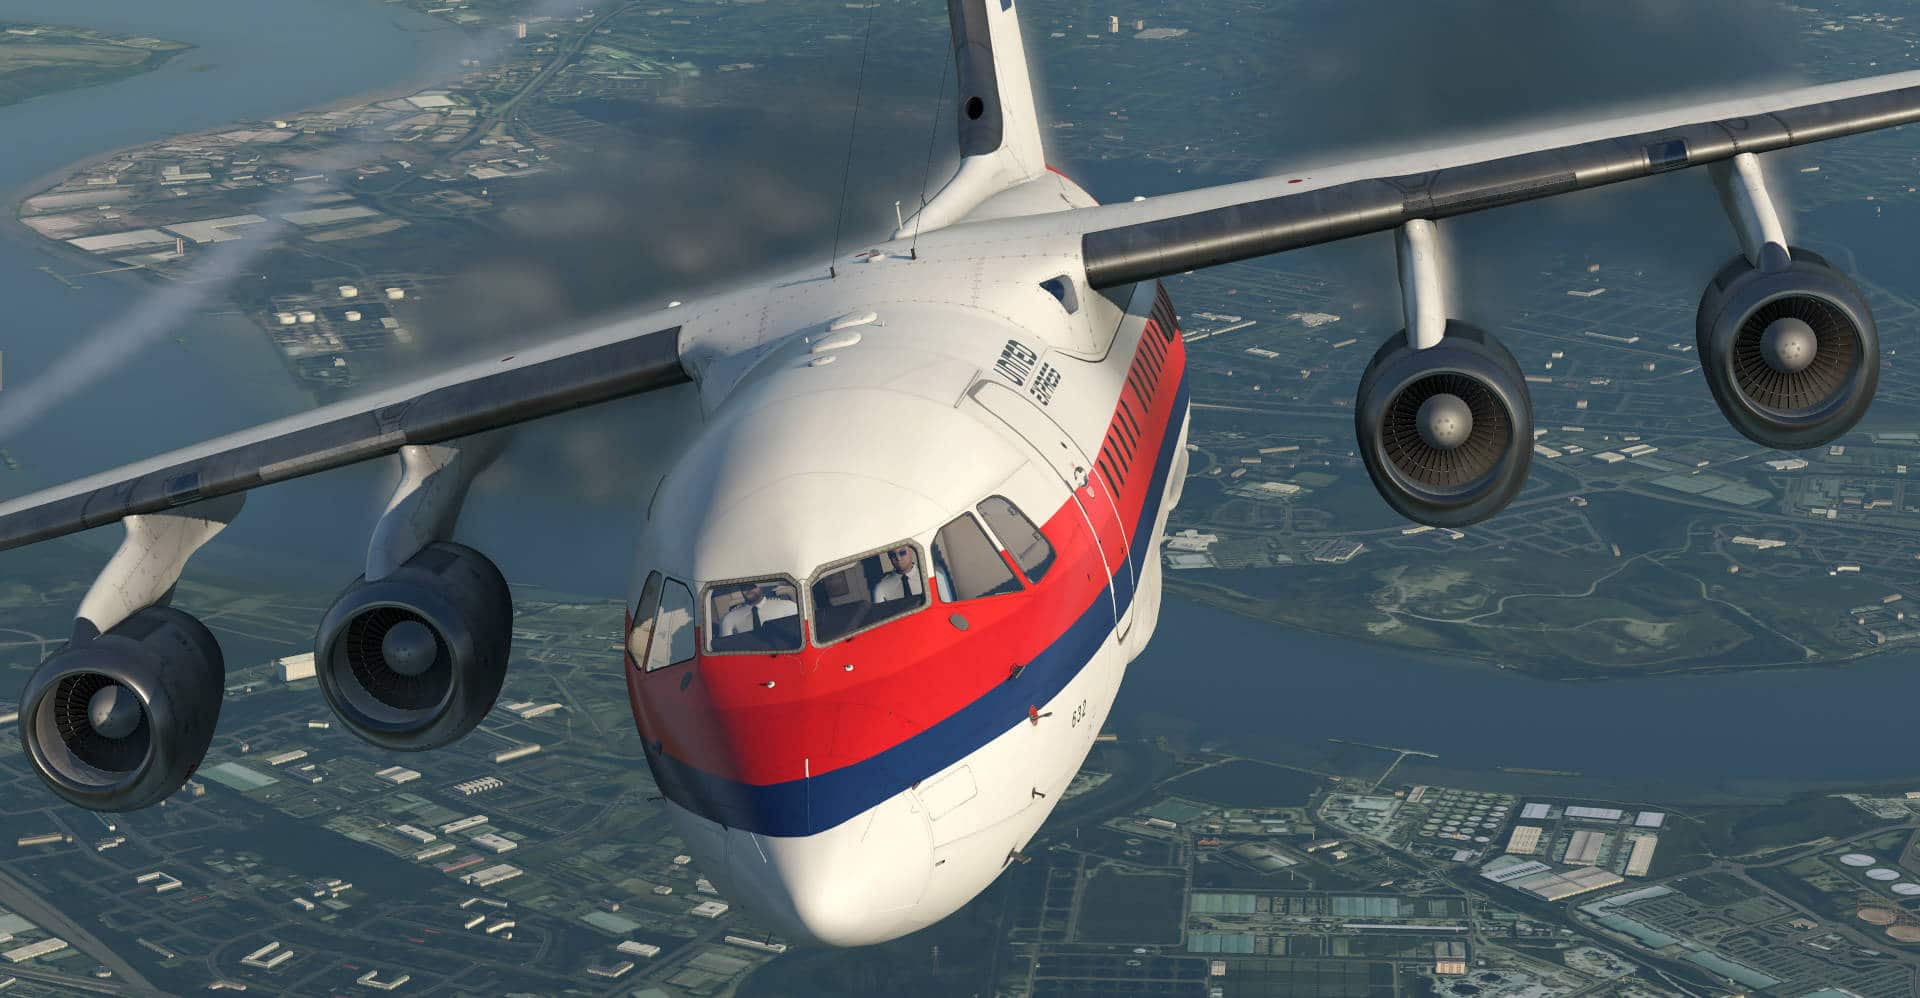 146-professional-xplane_55_ss_l_210105151816